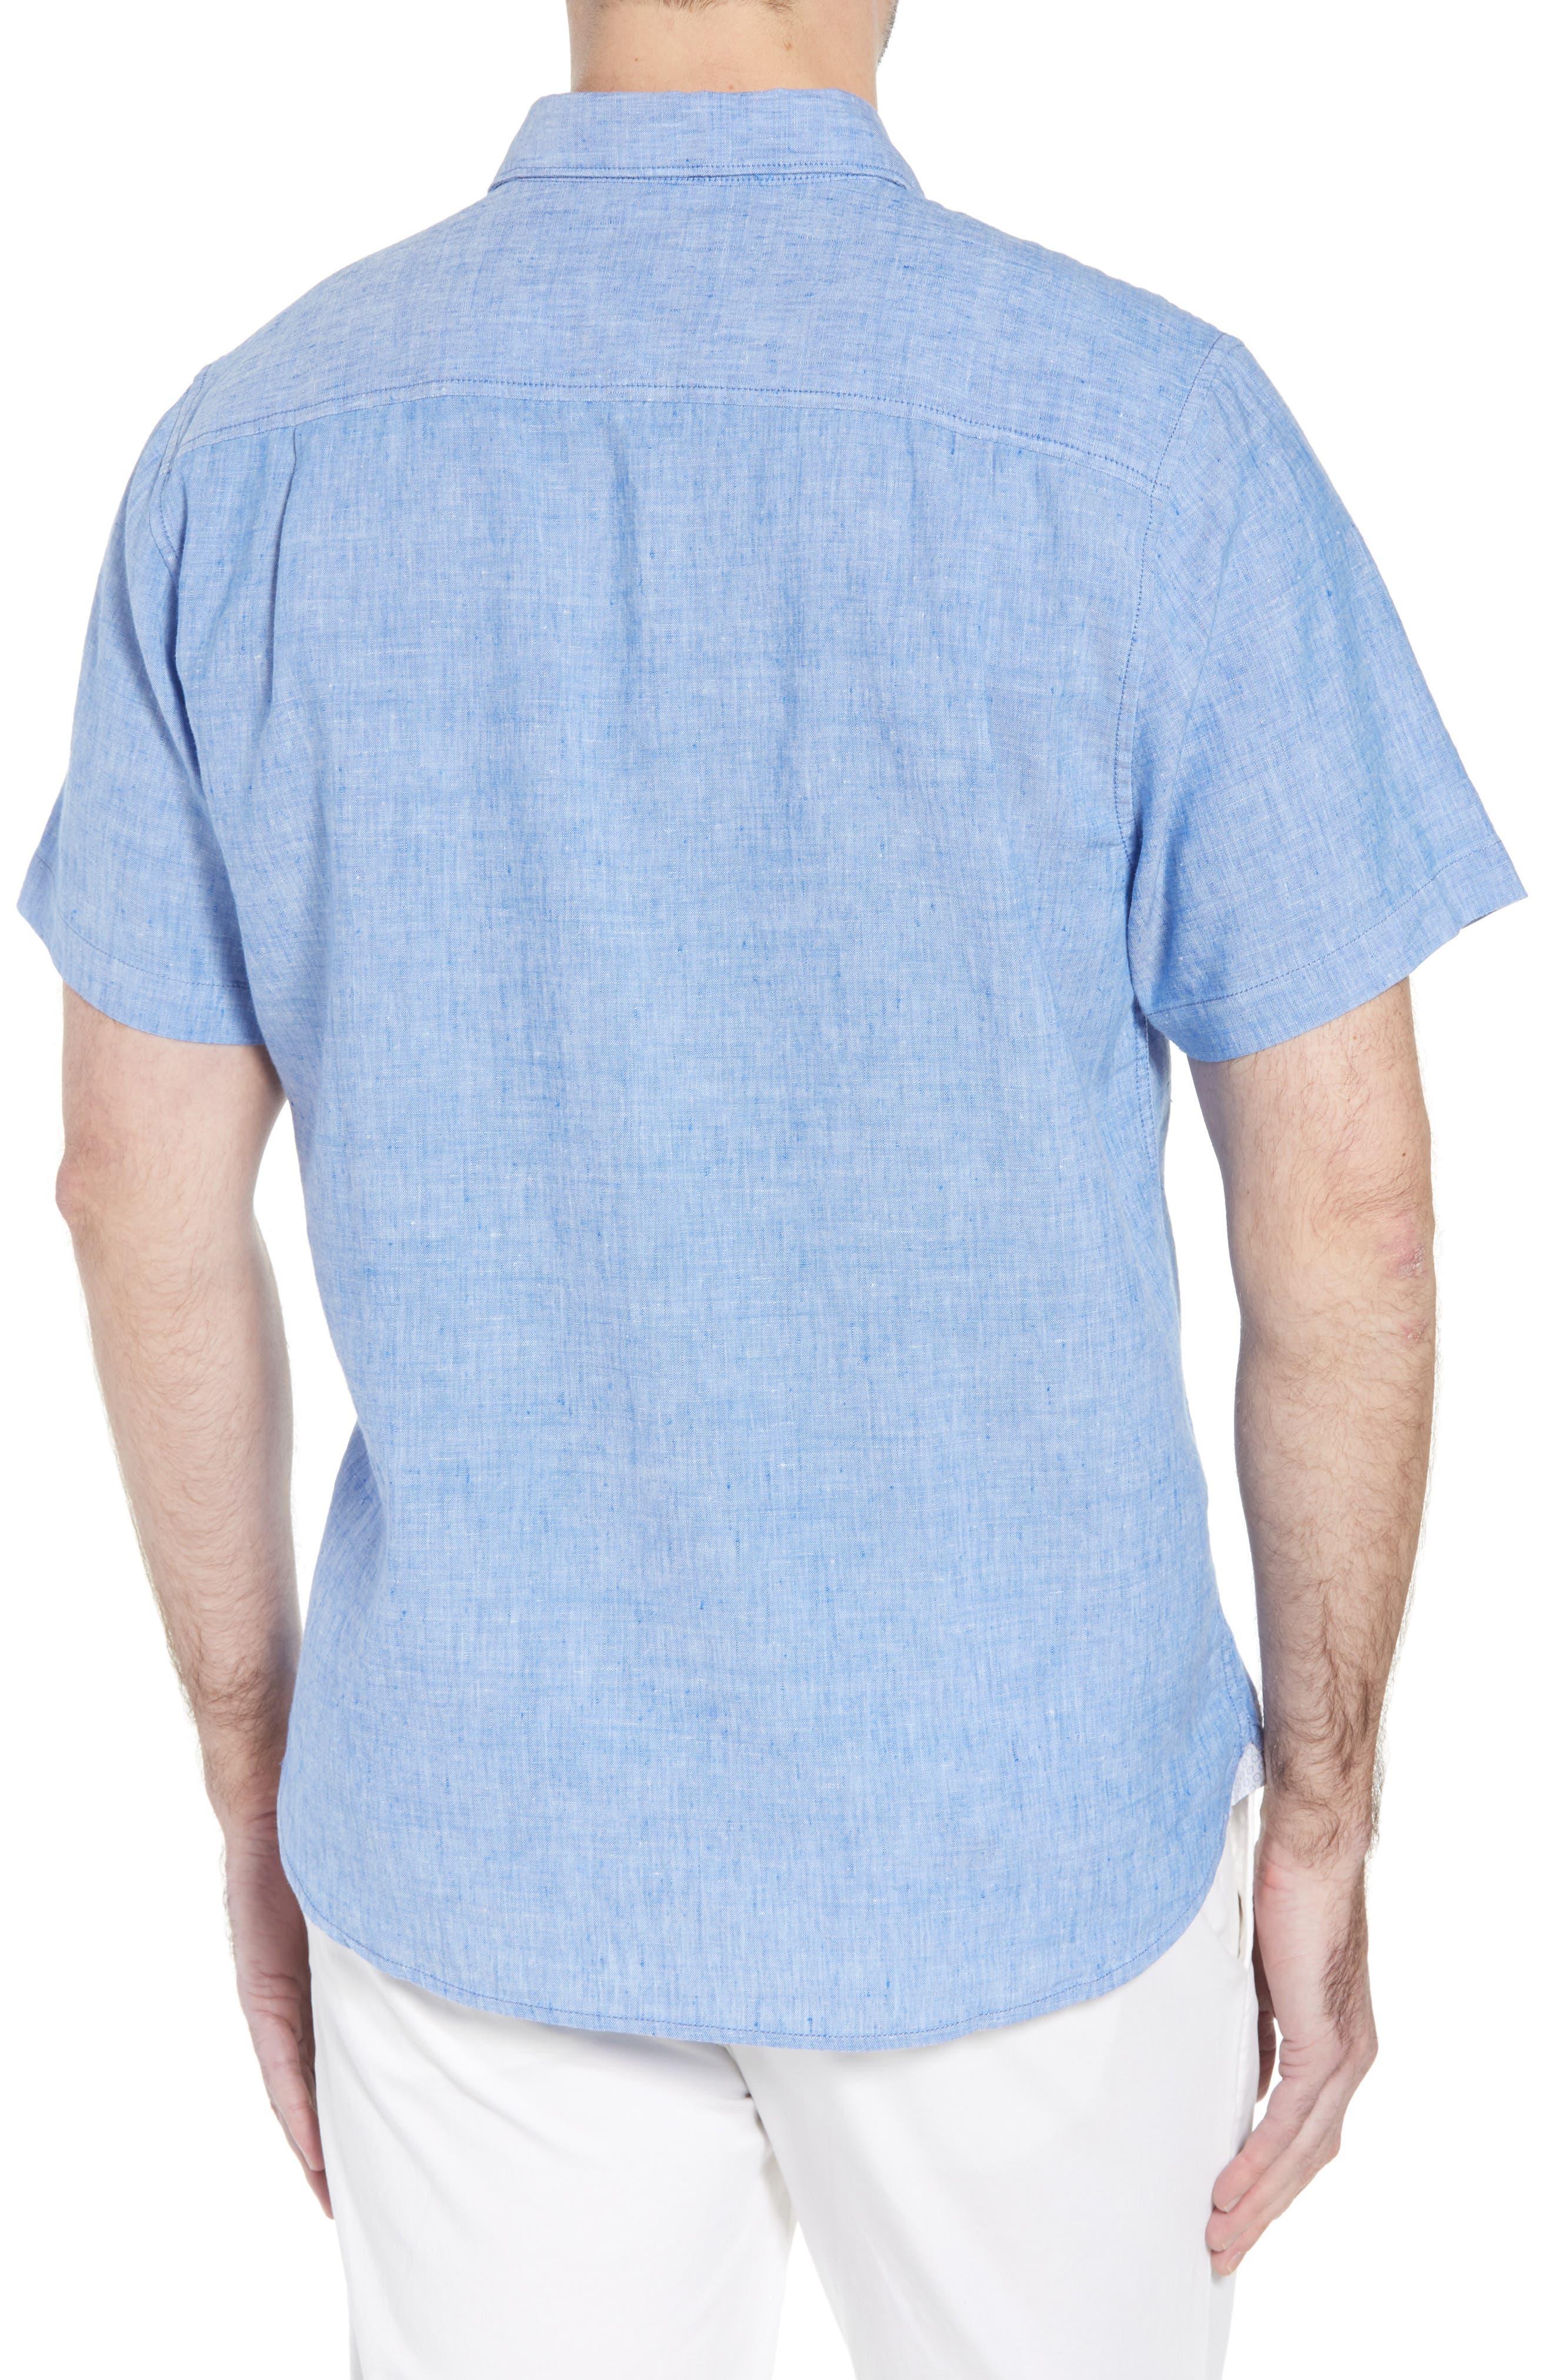 Lanai Tides Linen Blend Sport Shirt,                             Alternate thumbnail 2, color,                             Cobalt Sea